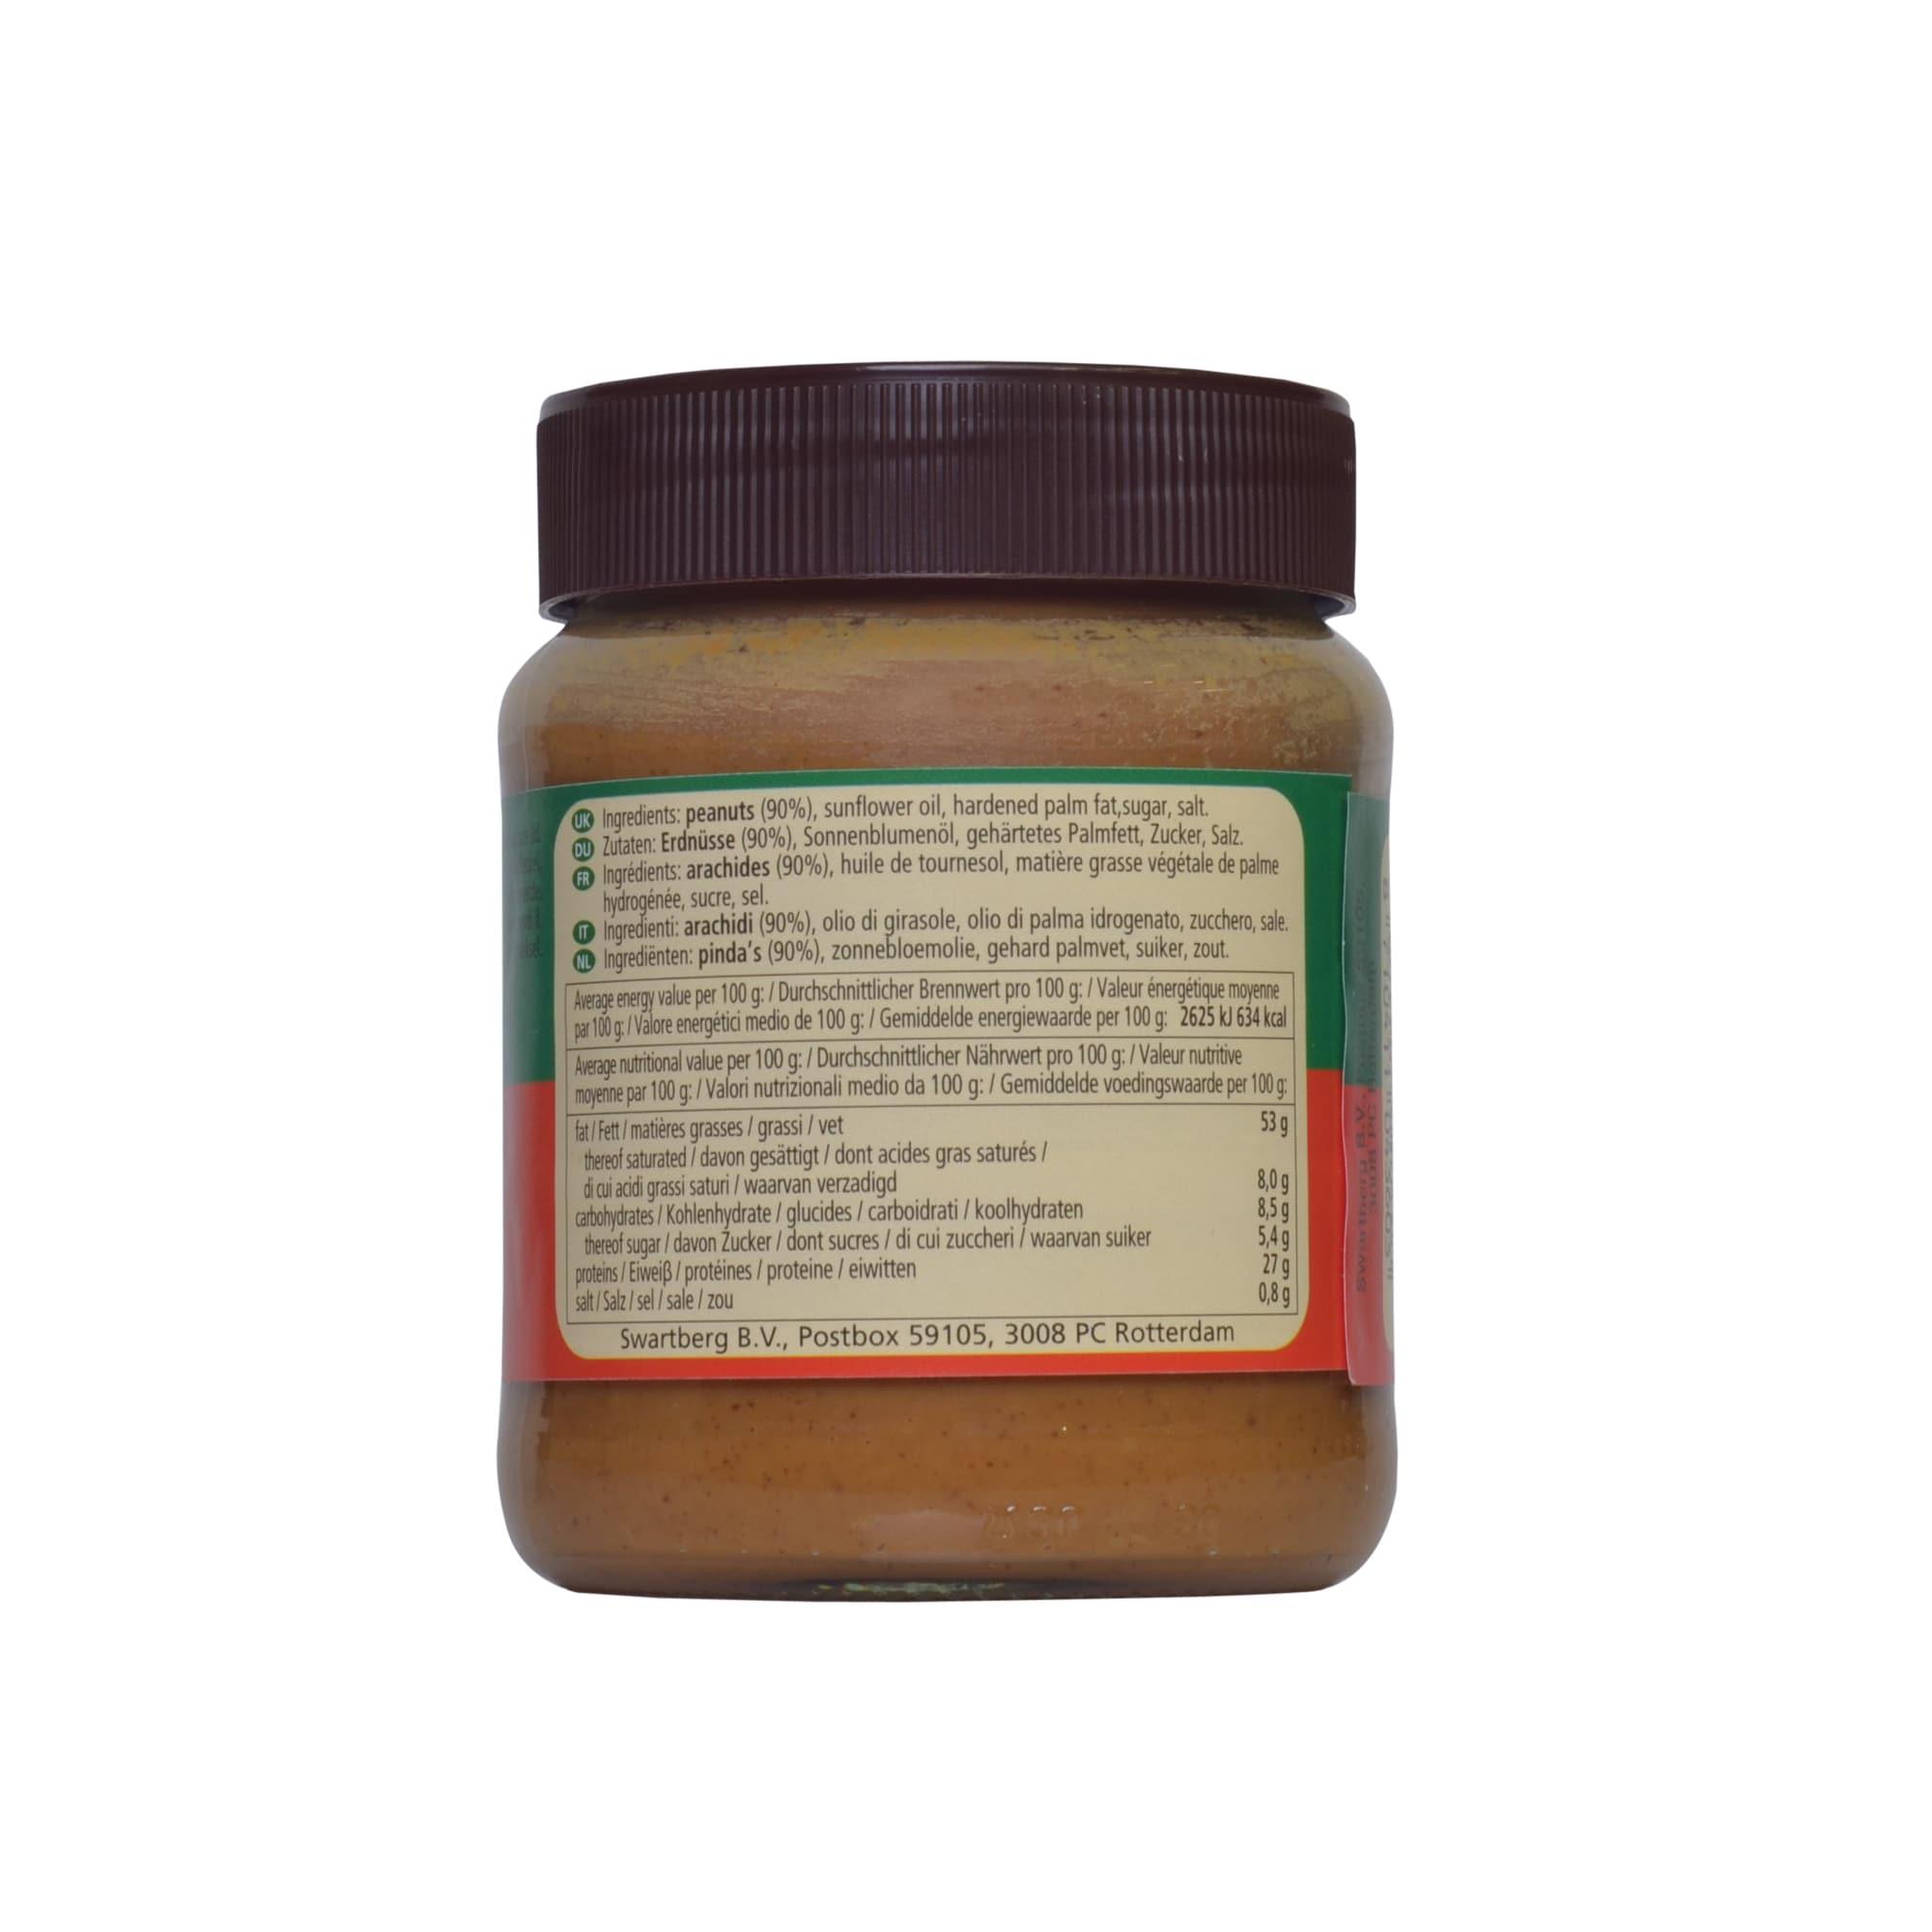 PCD Pinda Kaas Erdnussbutter / Erdnusspaste 350 g